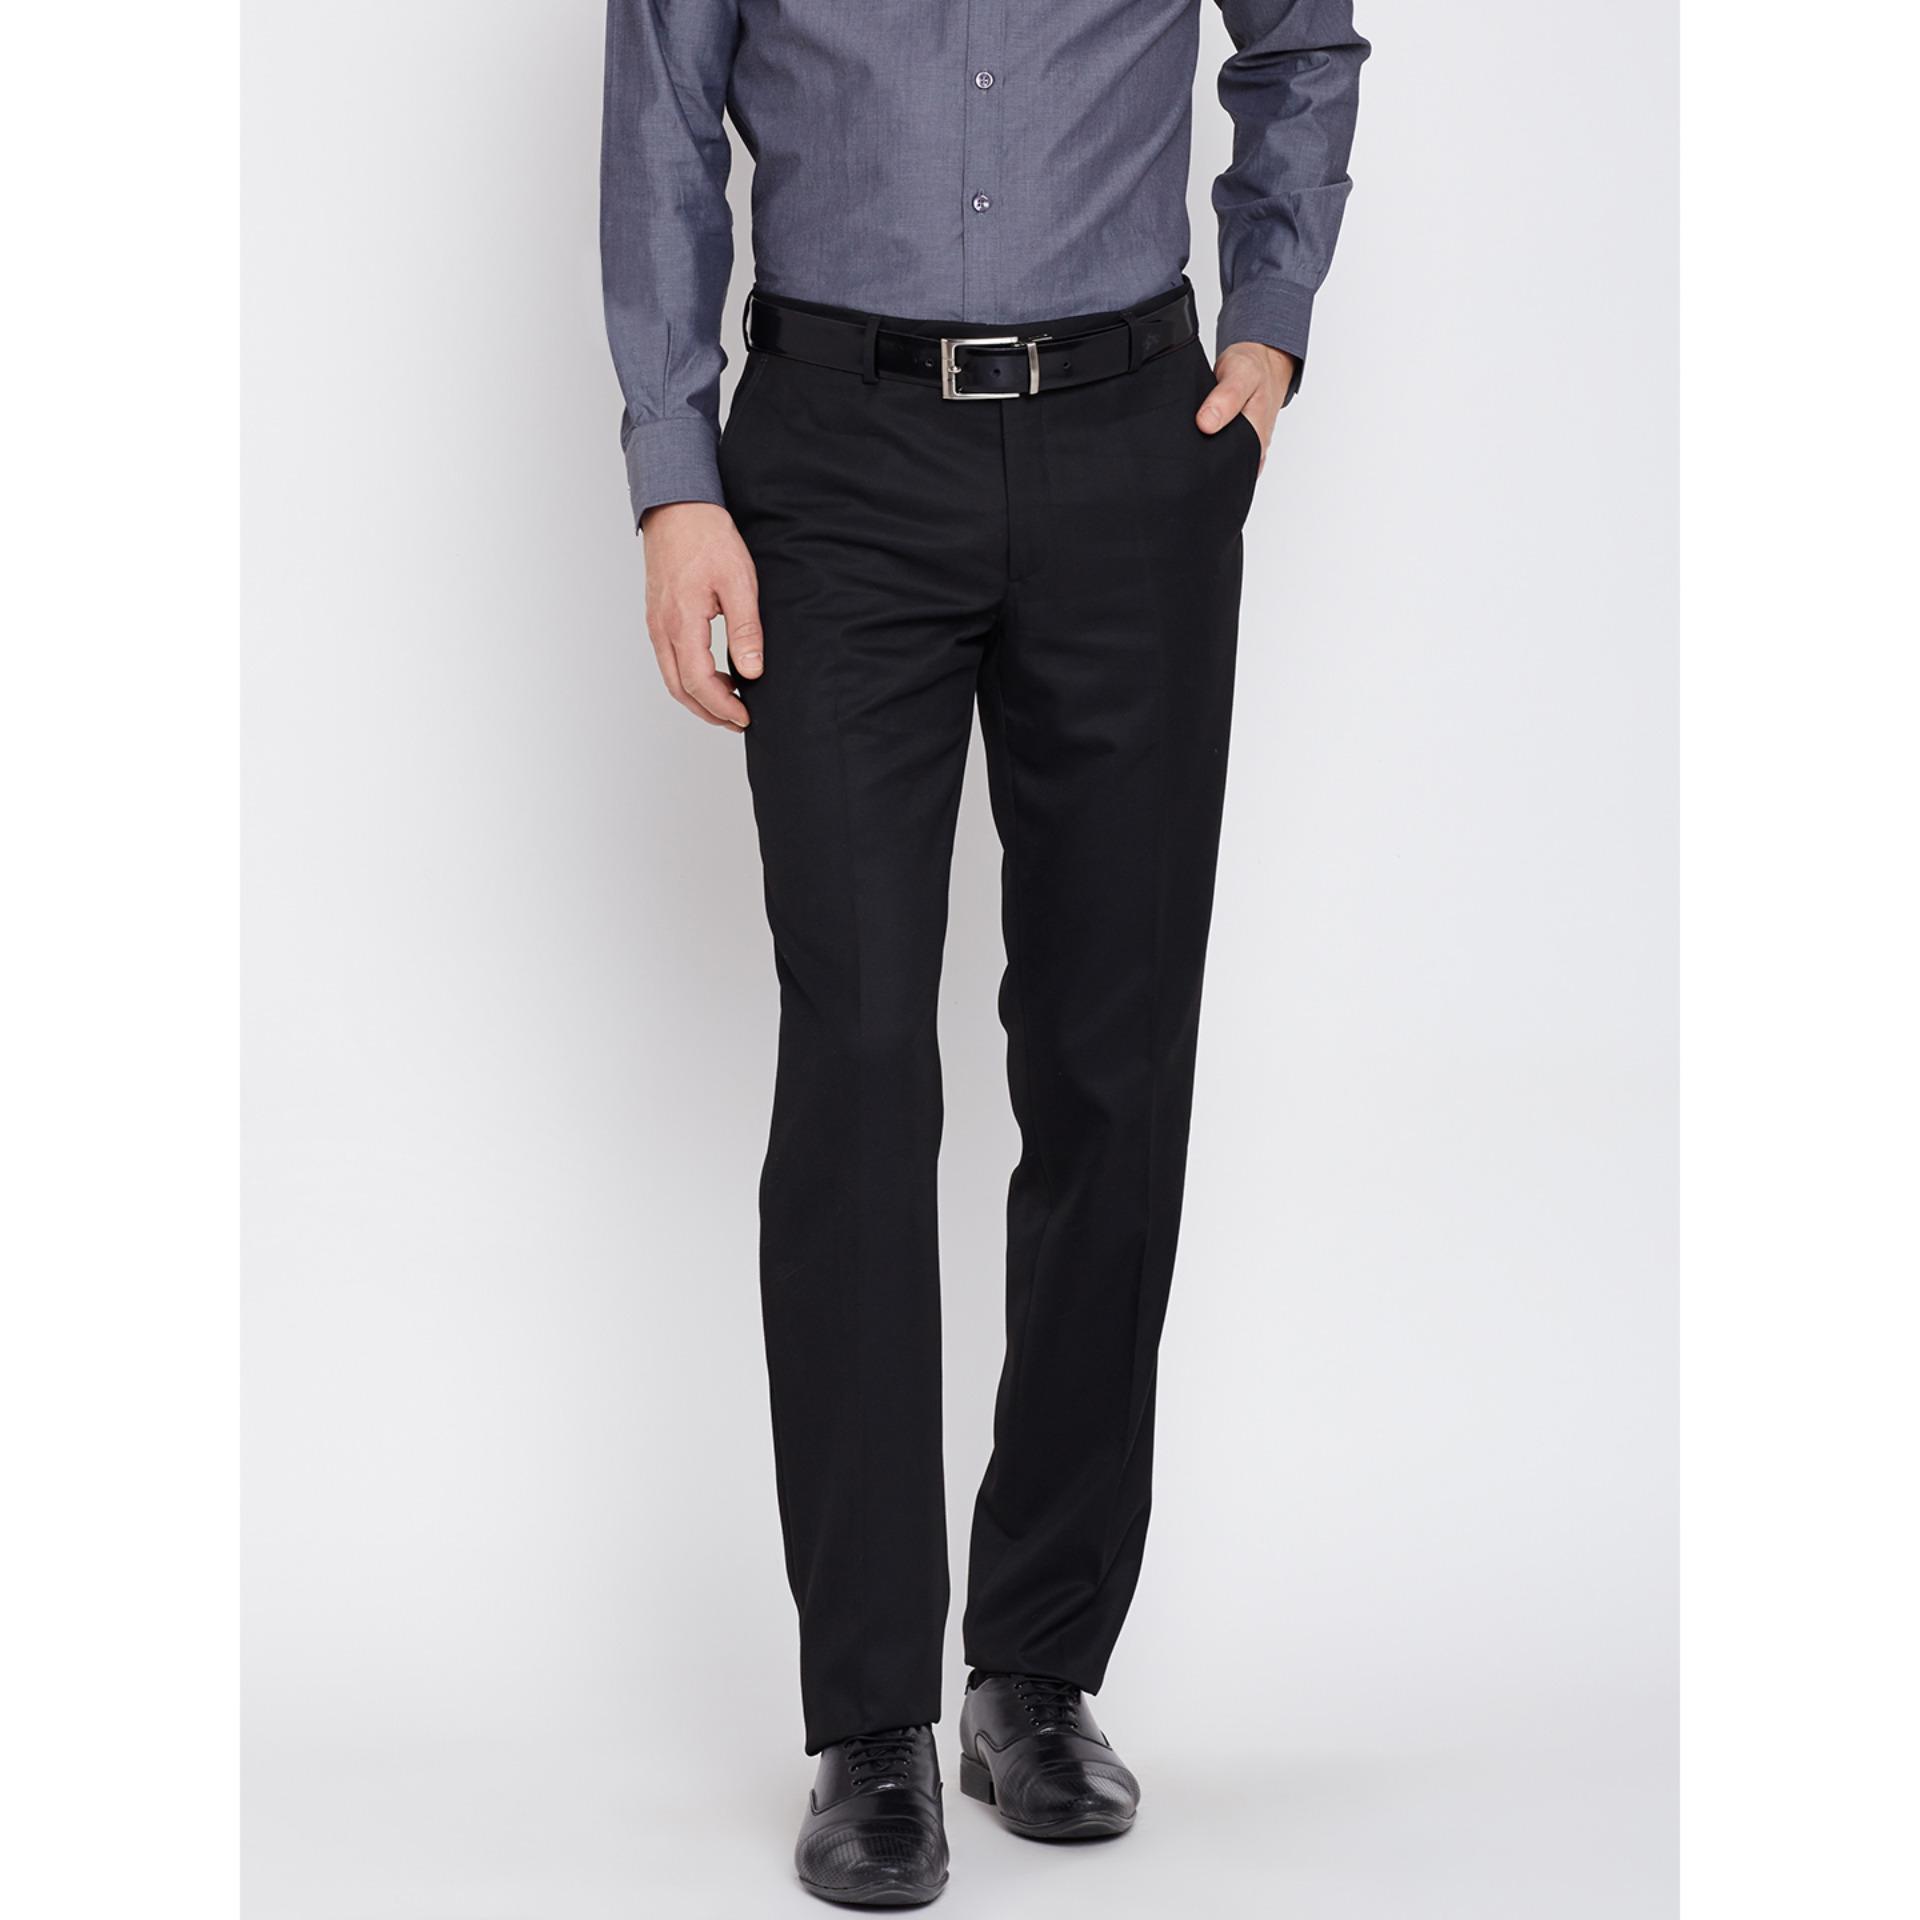 Jual Celana Pria Kerja Kantor Casual Formal Modern Slim Fit Hitam Baru